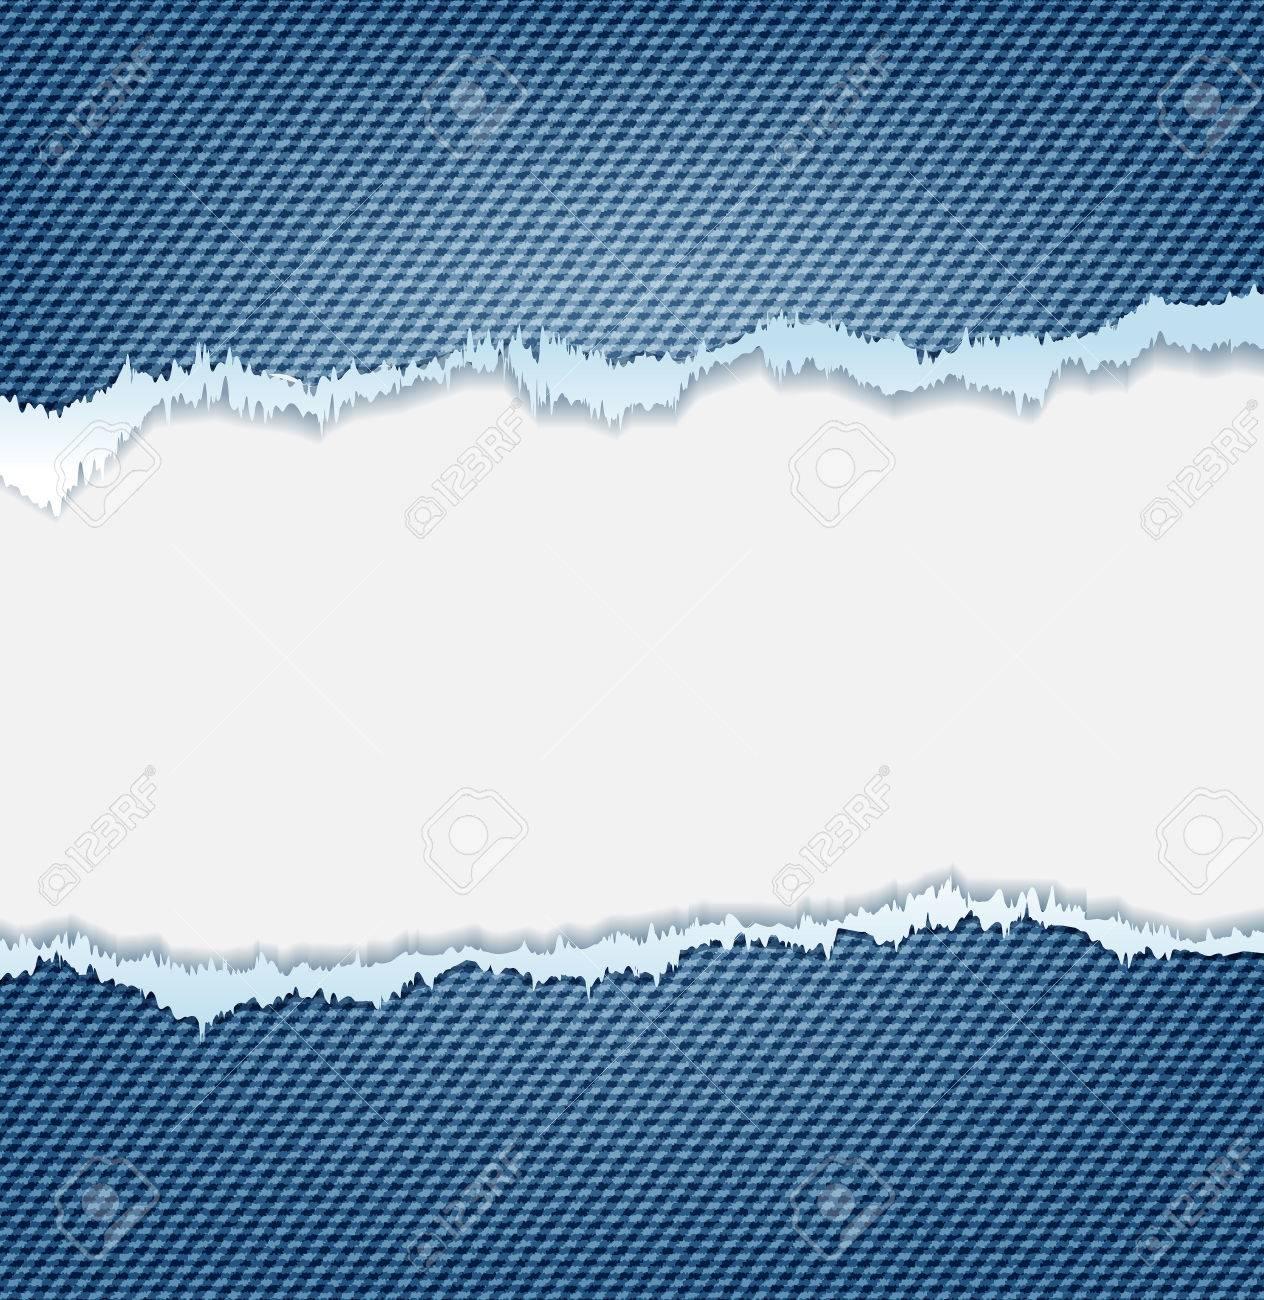 Denim Jeans Ripped Destroyed Torn Blue Patch Ausgefranst Klappe ...